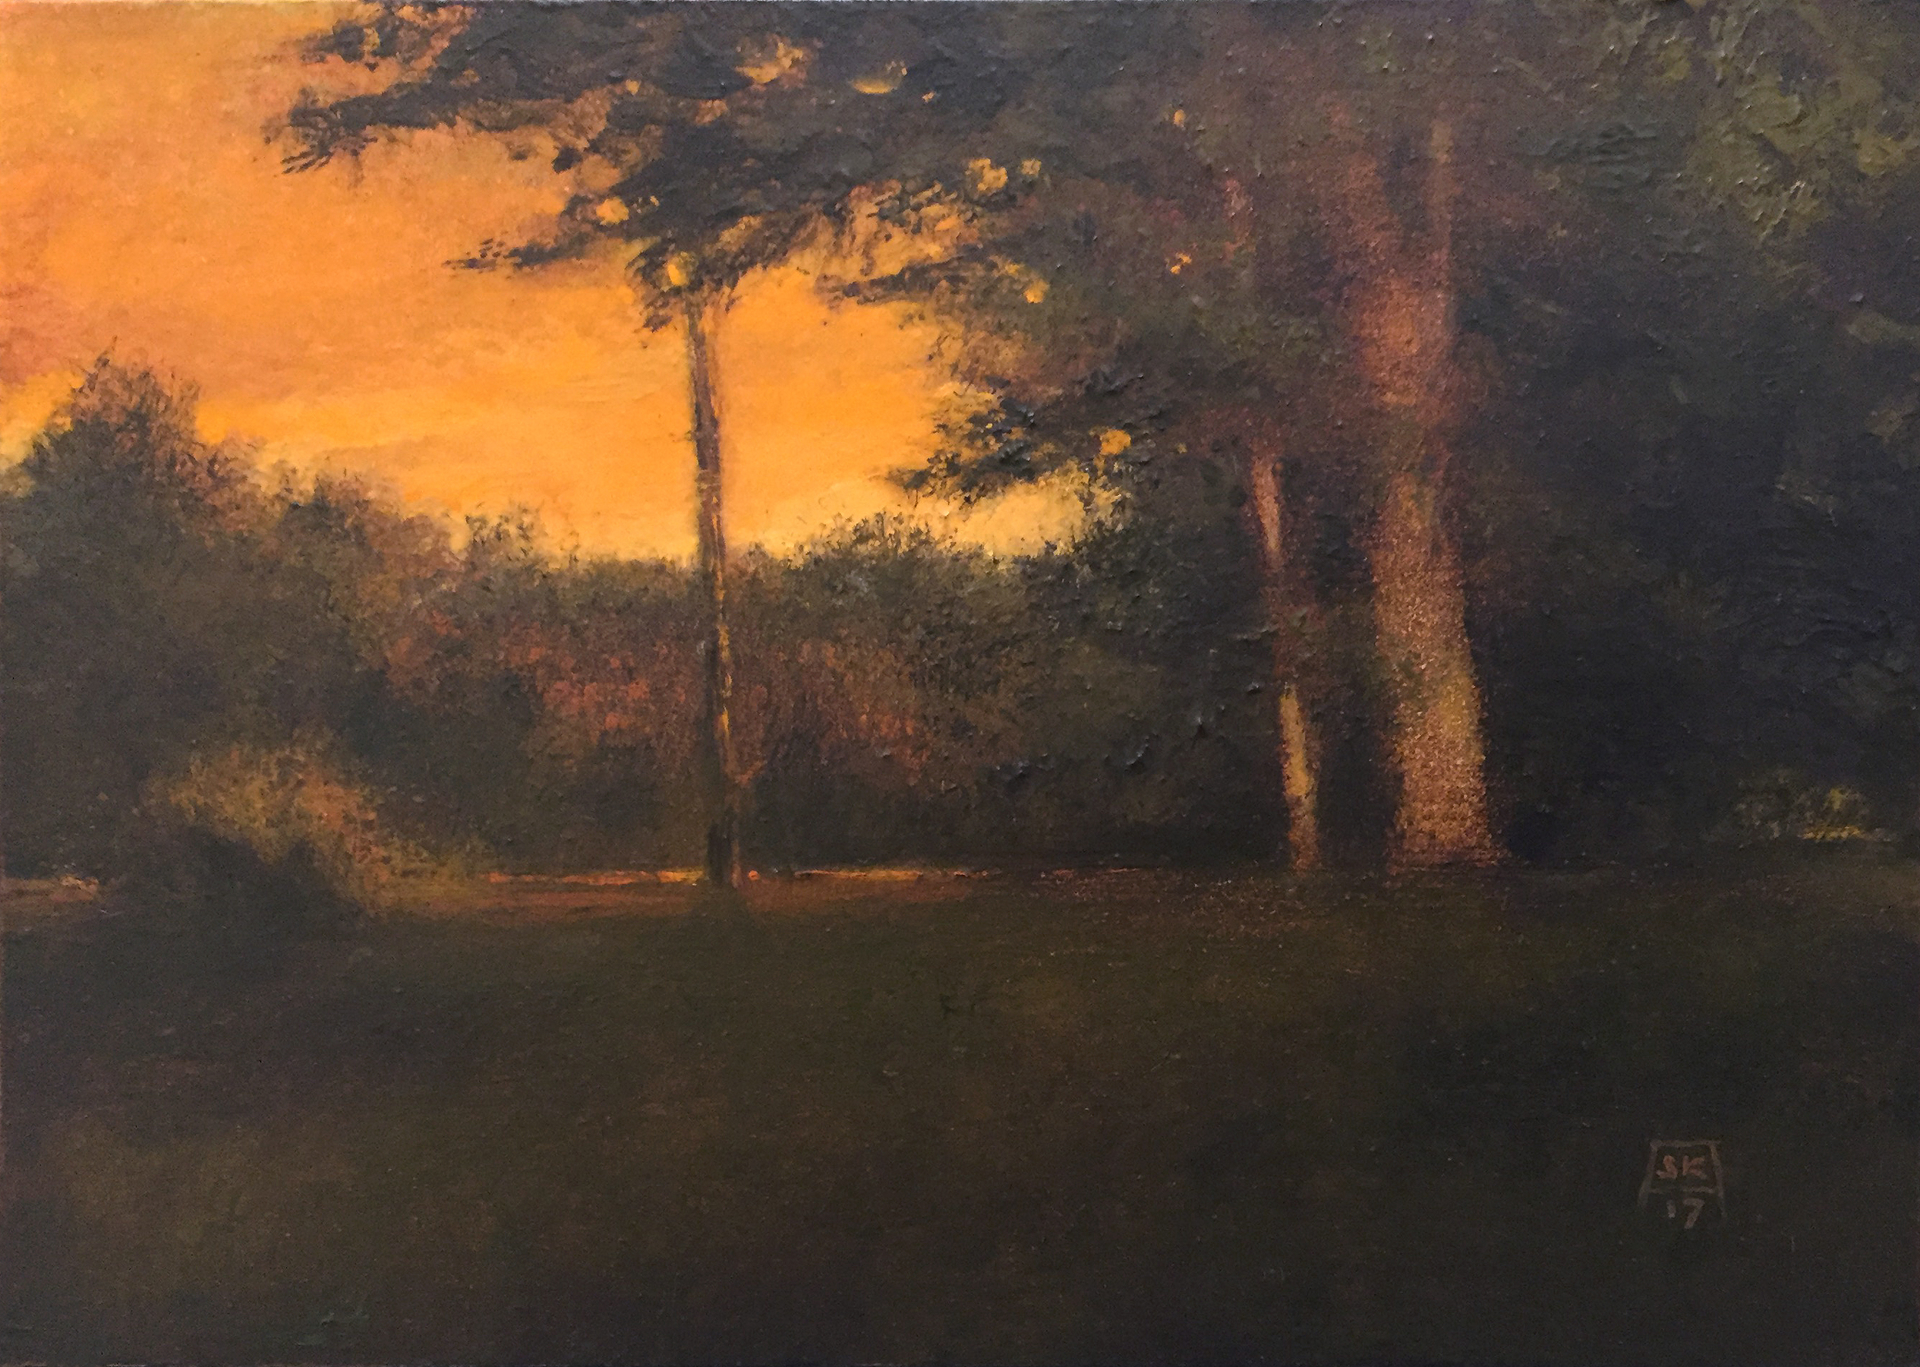 Georgian Trees by Shawn Krueger